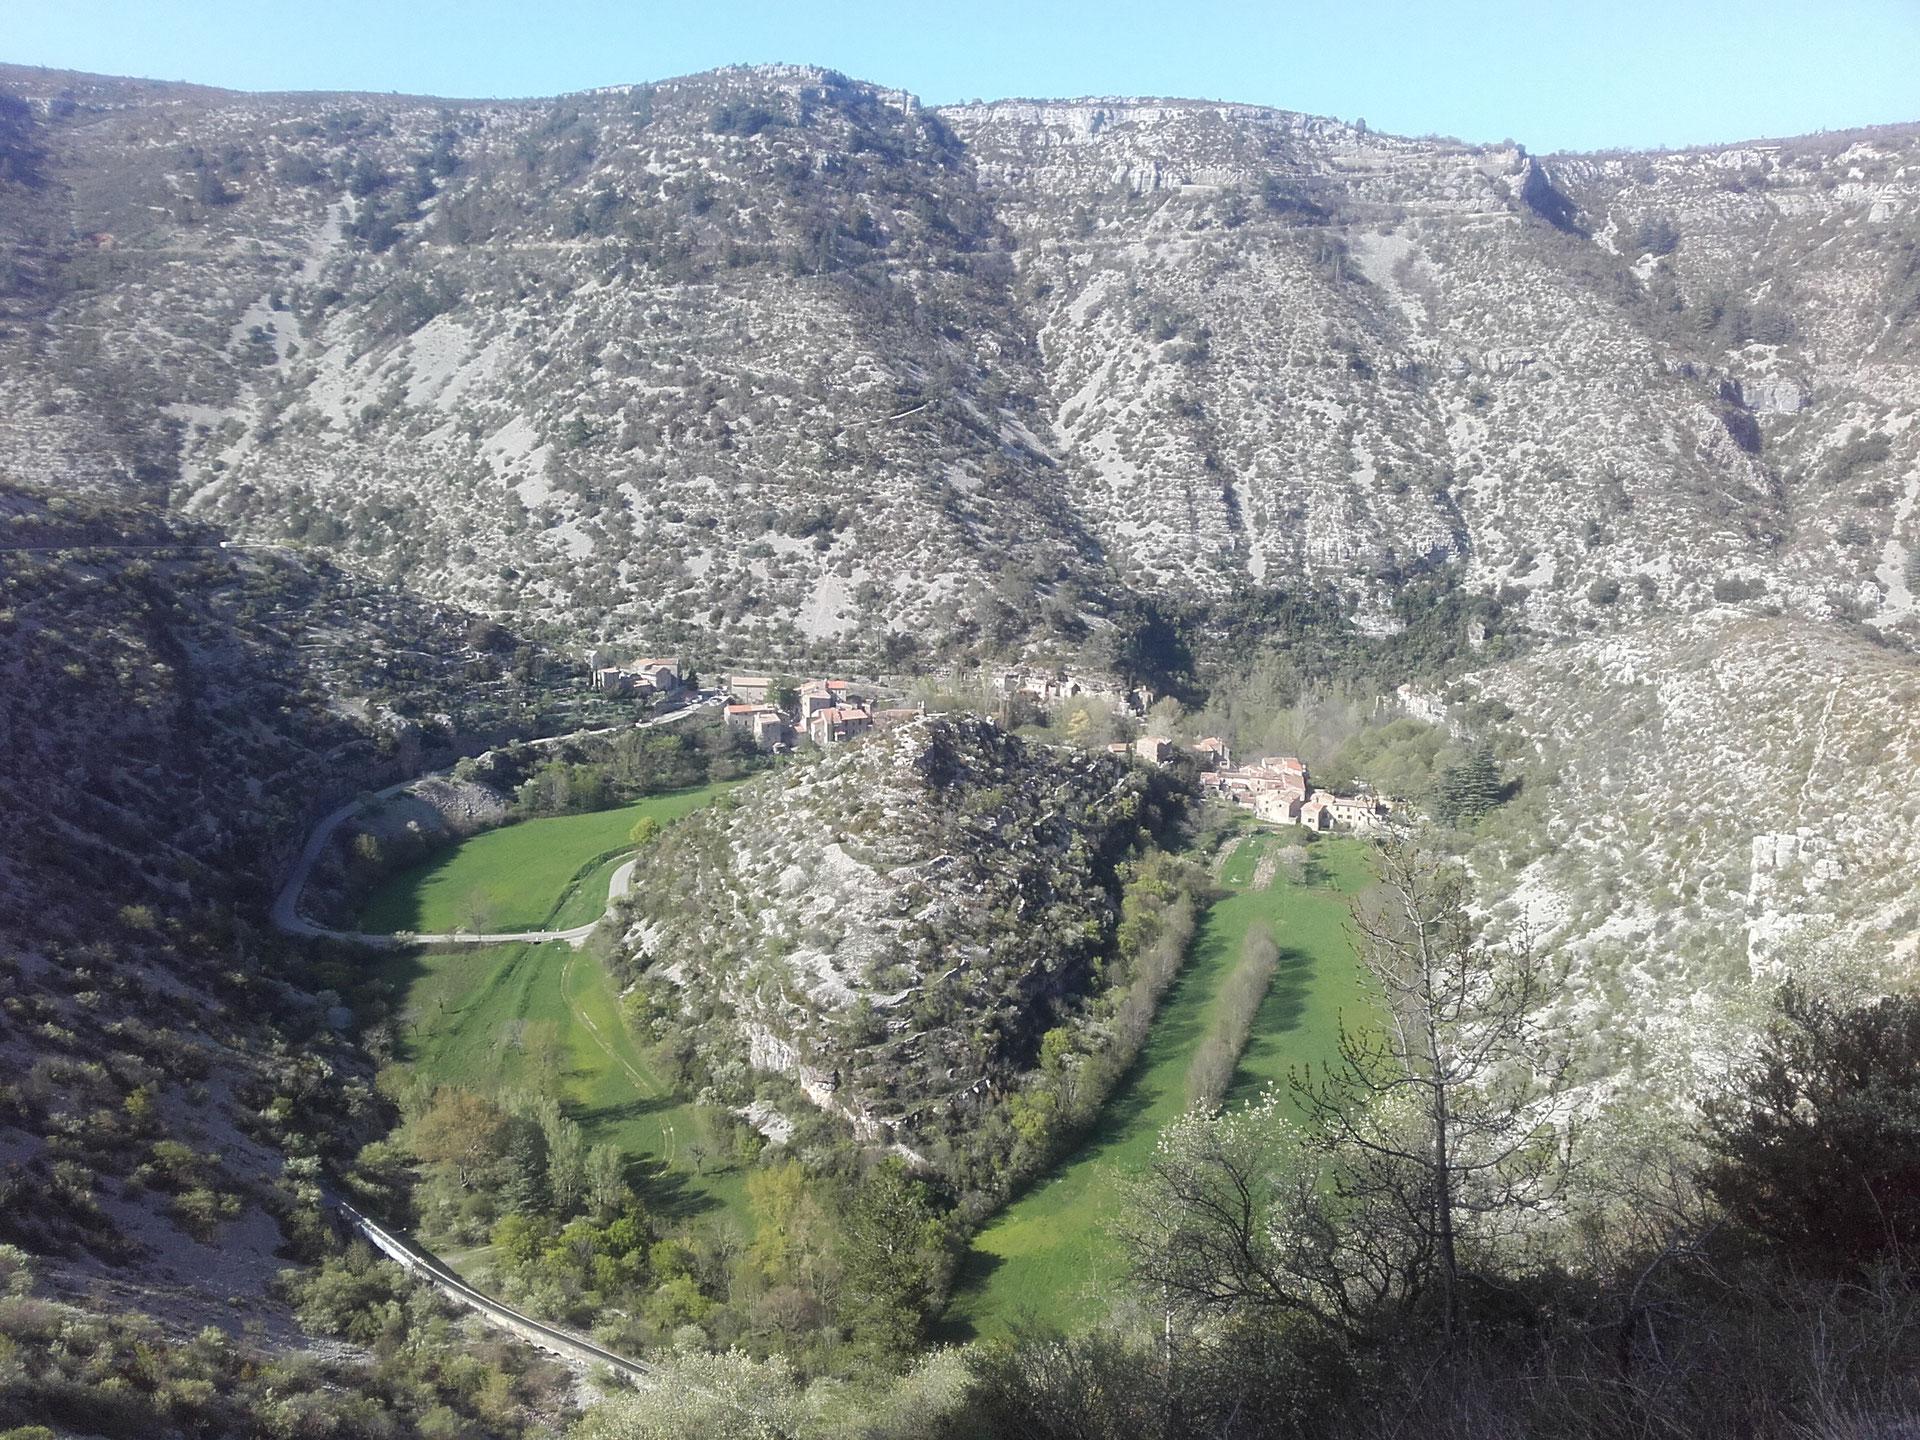 Calendrier des randonnées 2019 - Site de cyclo-club